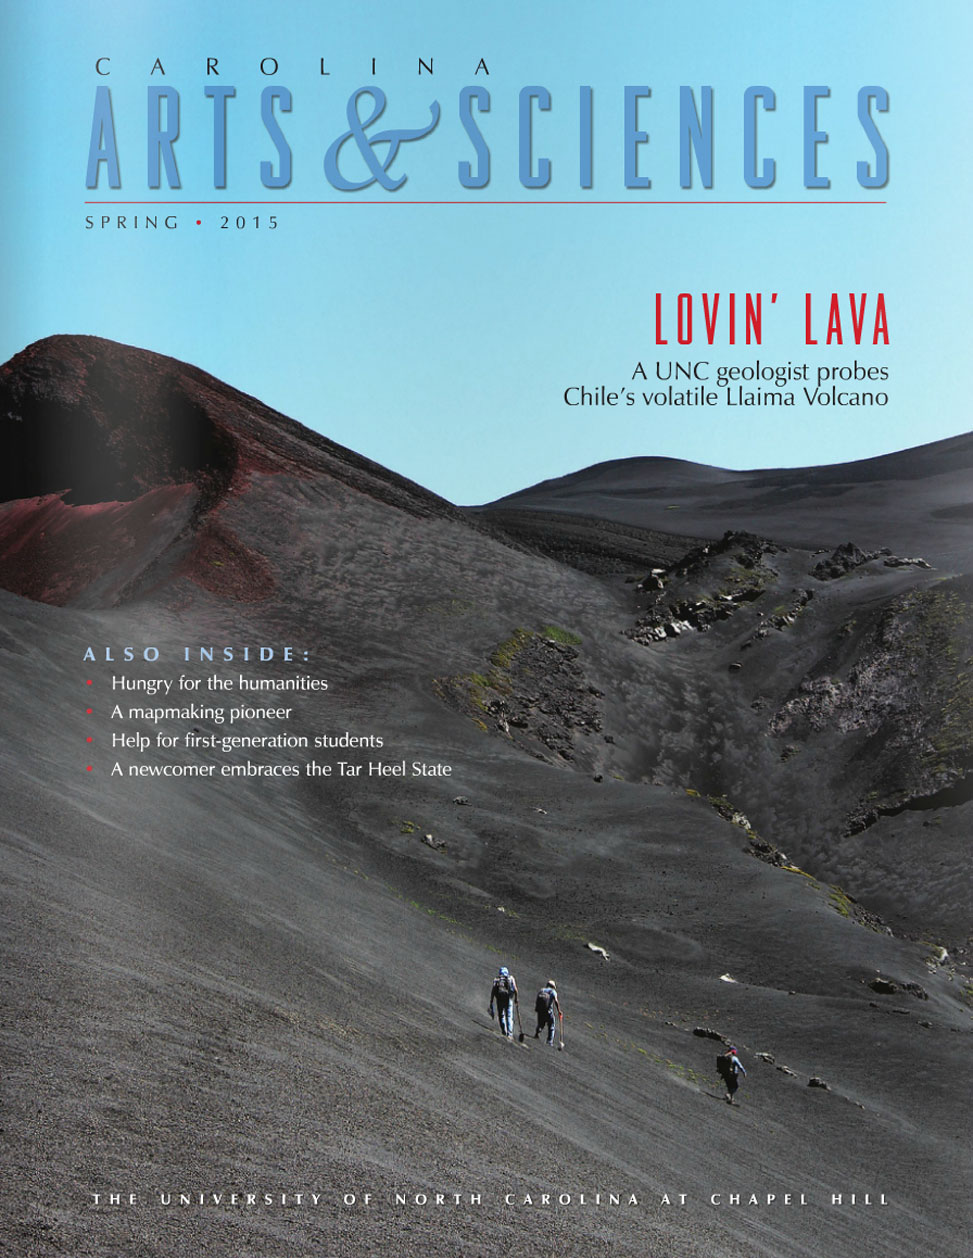 Spring 2015 Magazine Cover